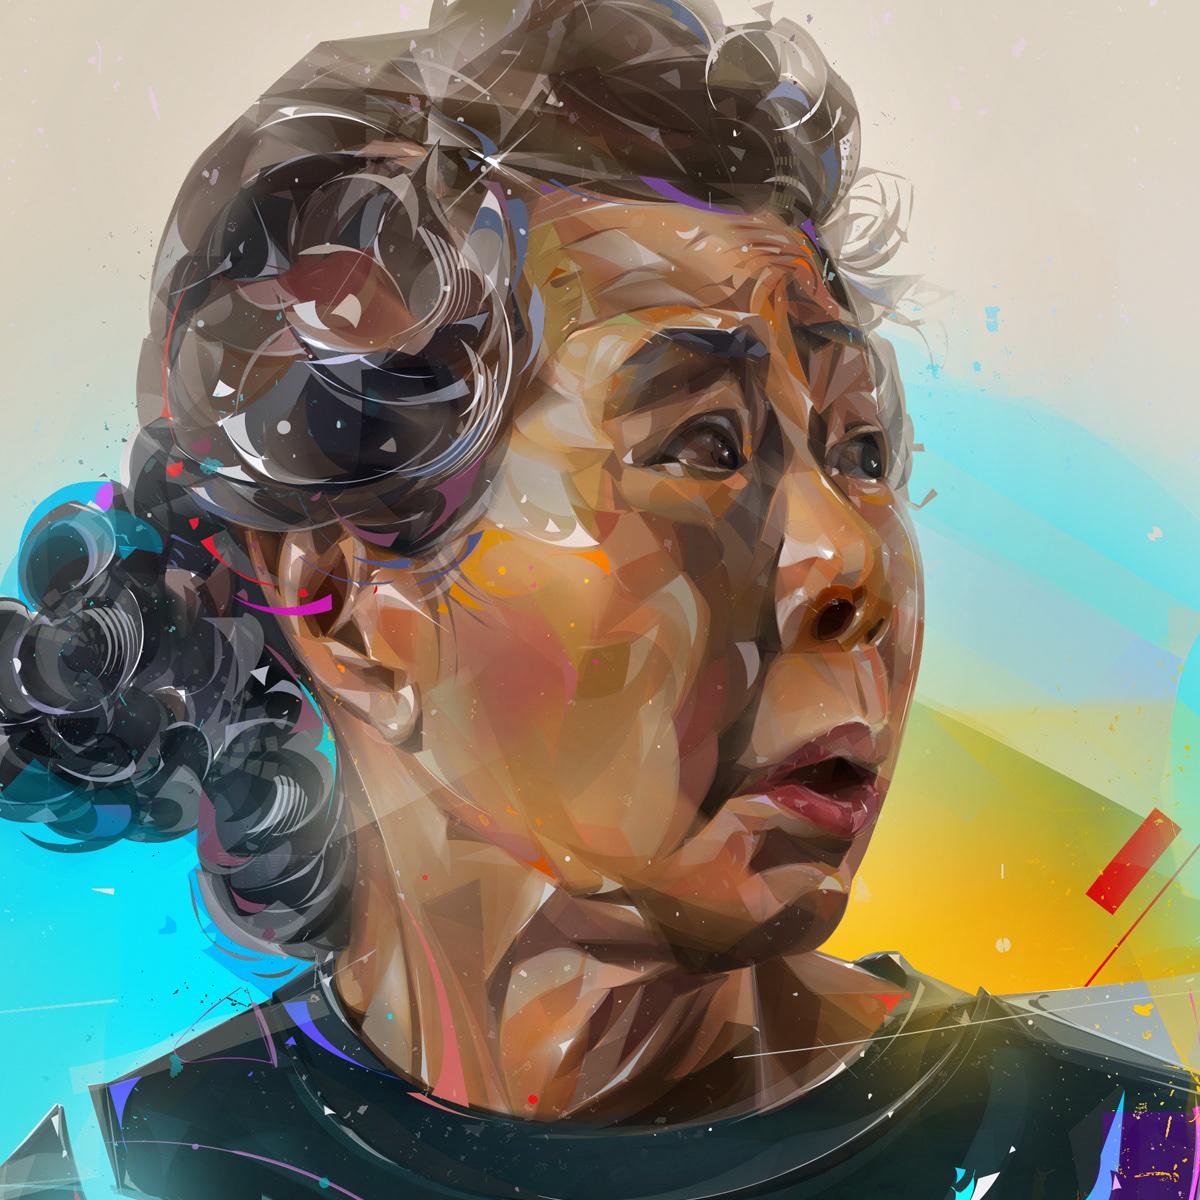 2021 design Anthony Hopkins cover editorial Film   magazine movie oscar portrait stars